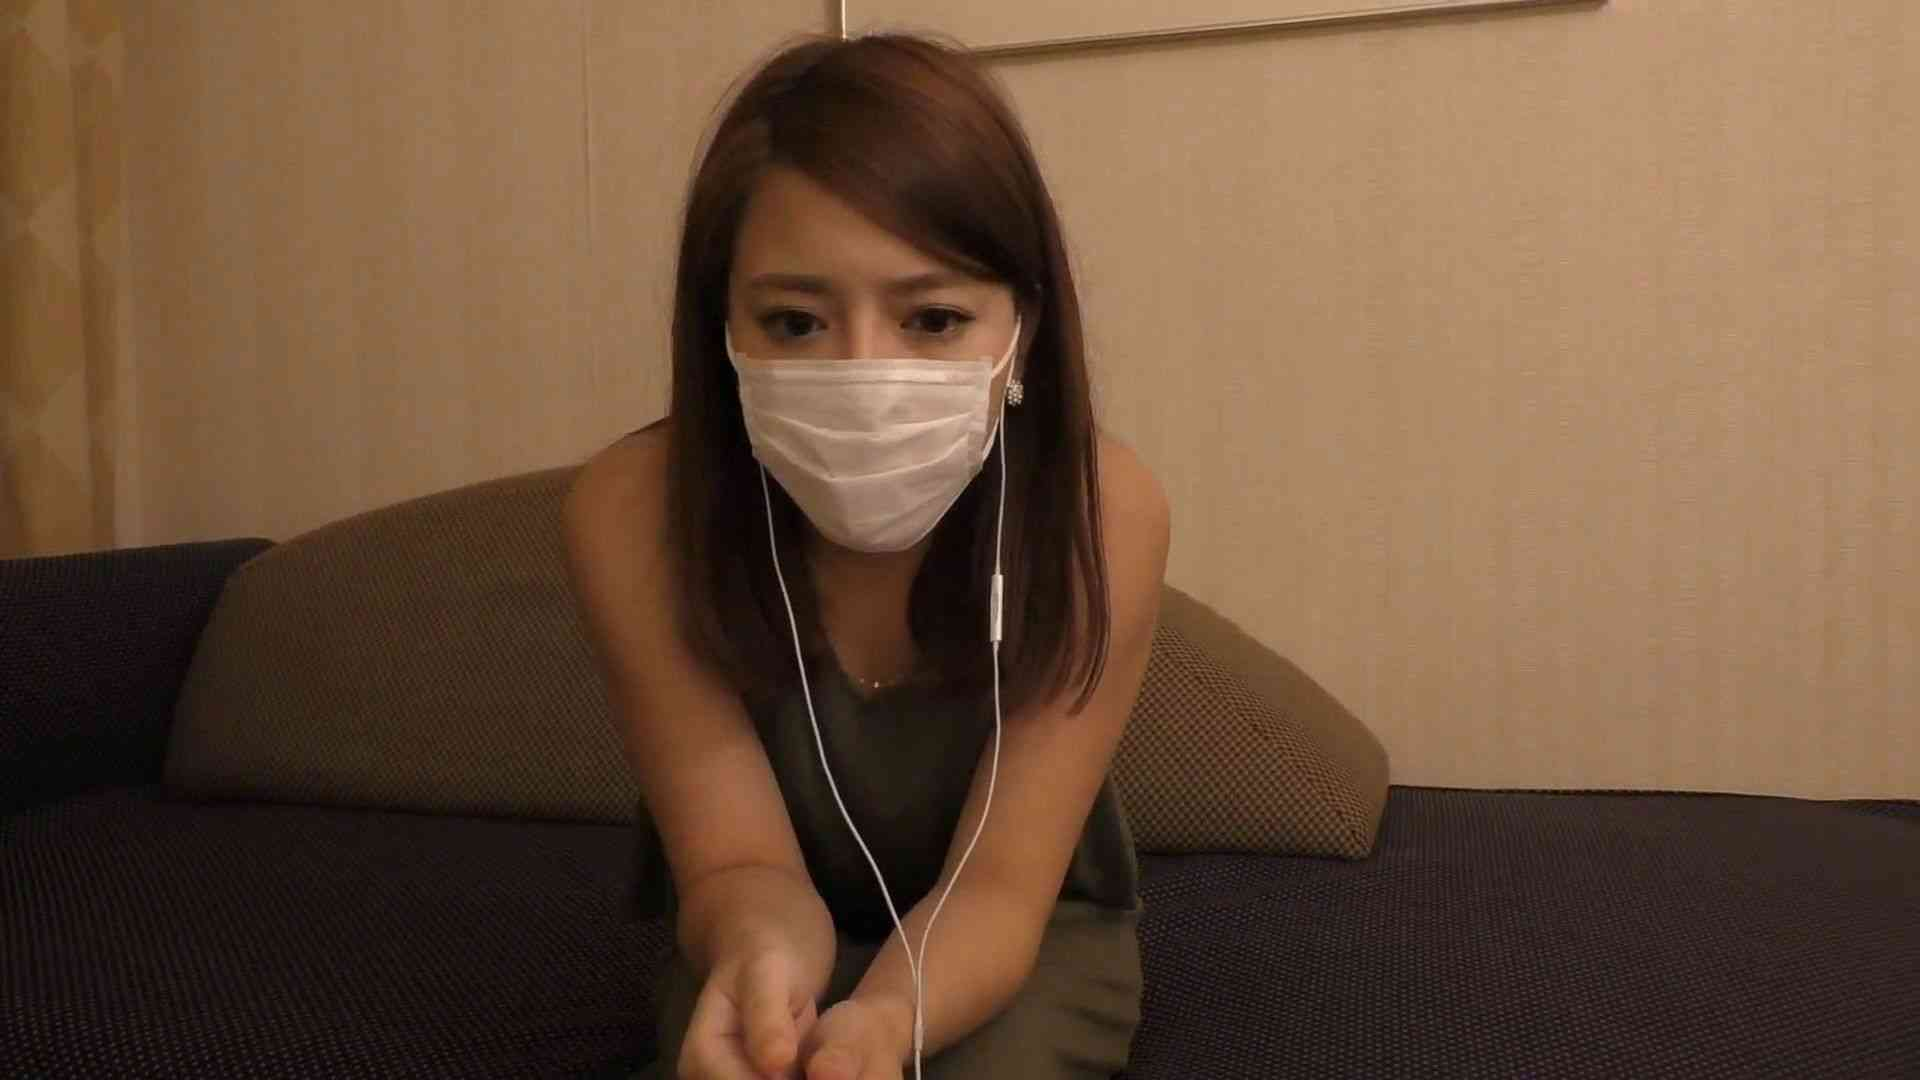 S級厳選美女ビッチガールVol.19 モデル流出動画  86画像 3